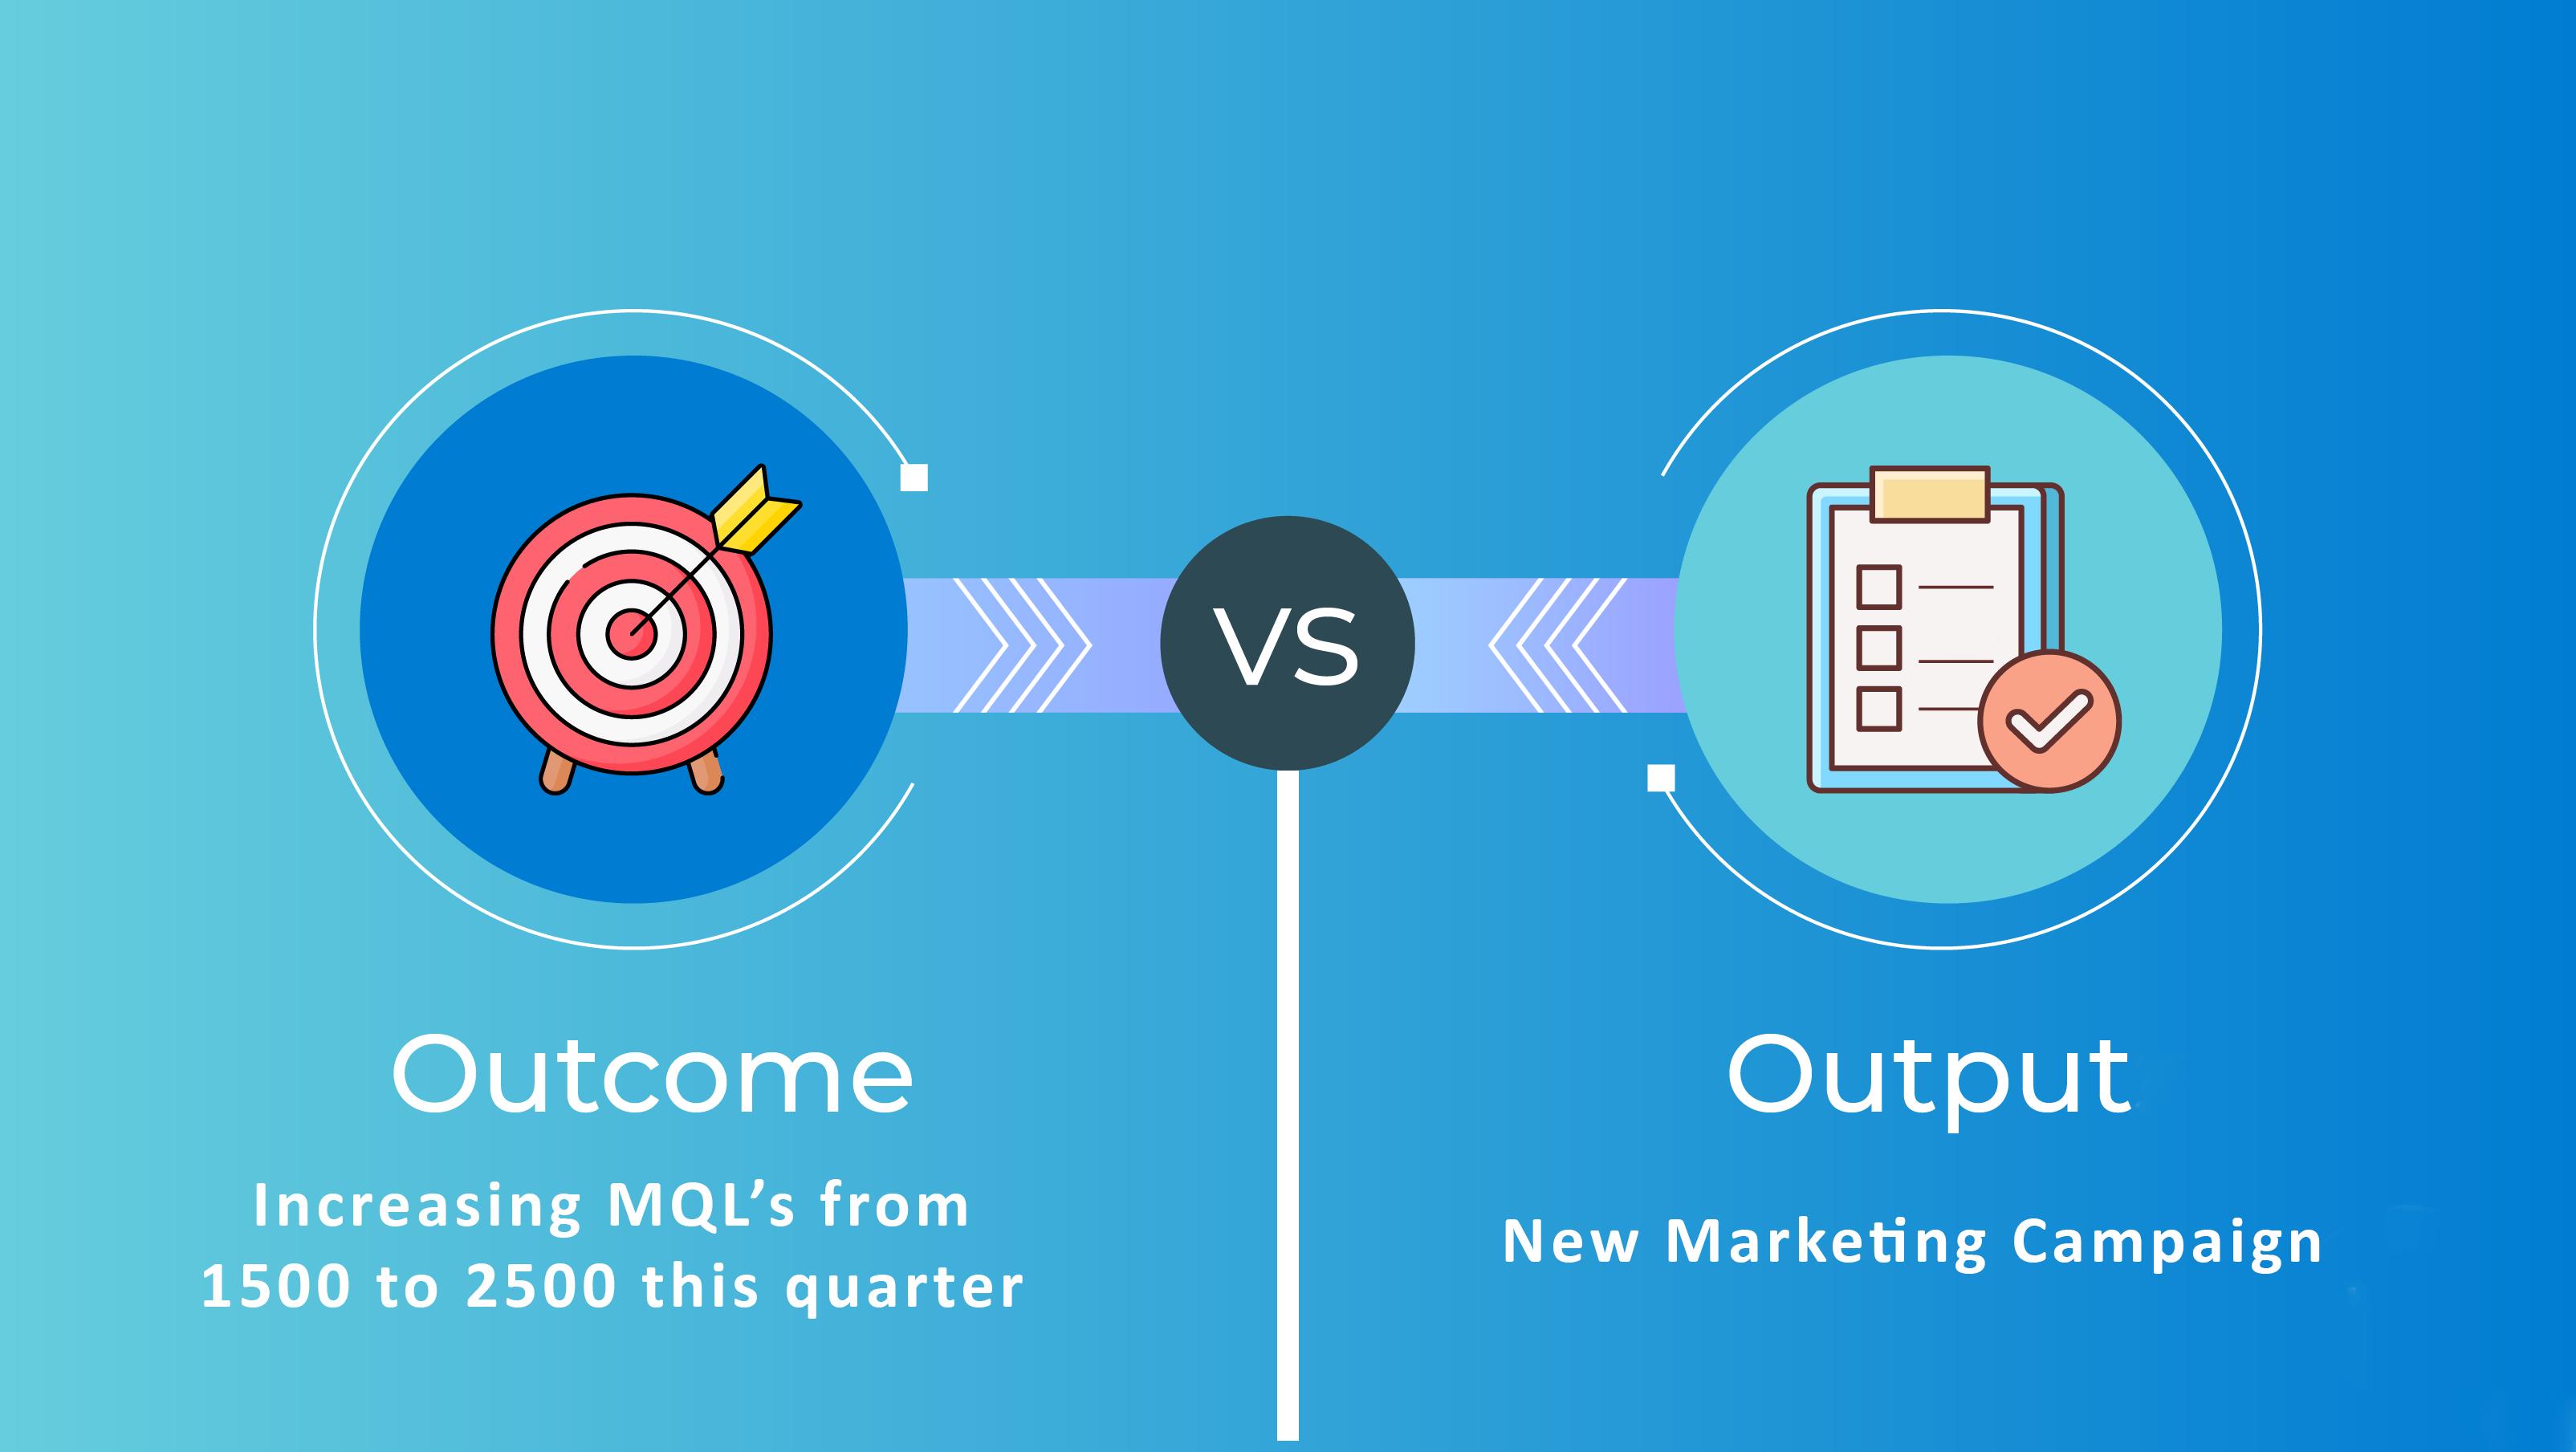 outcome-vs-output